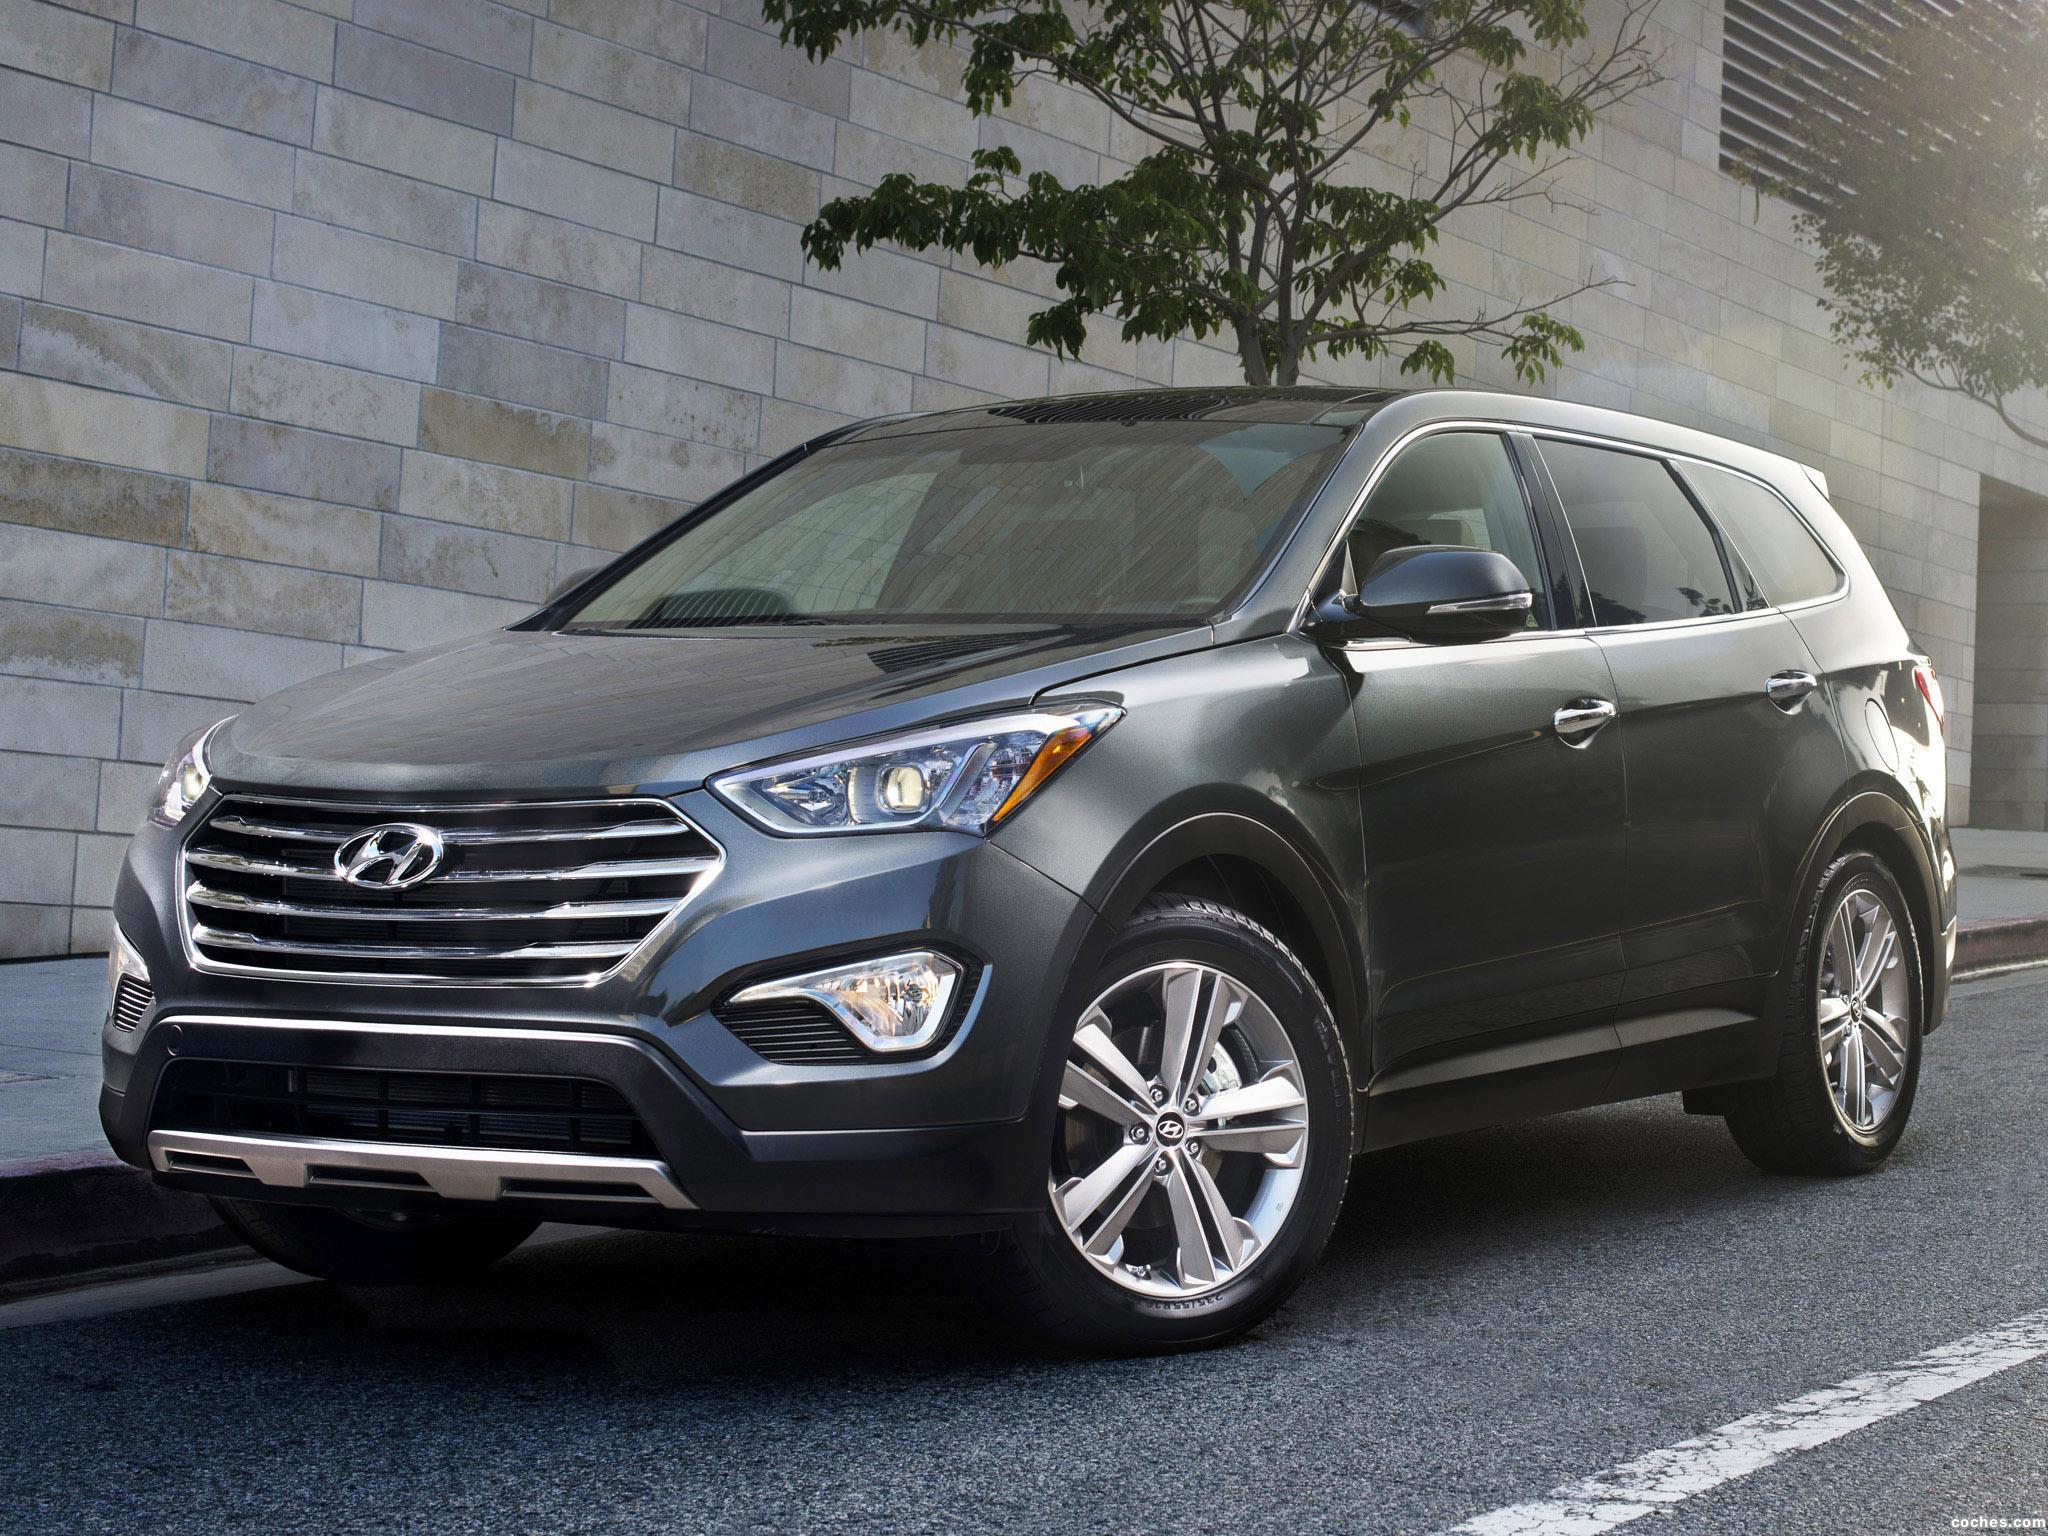 Foto 0 de Hyundai Santa Fe USA 2012